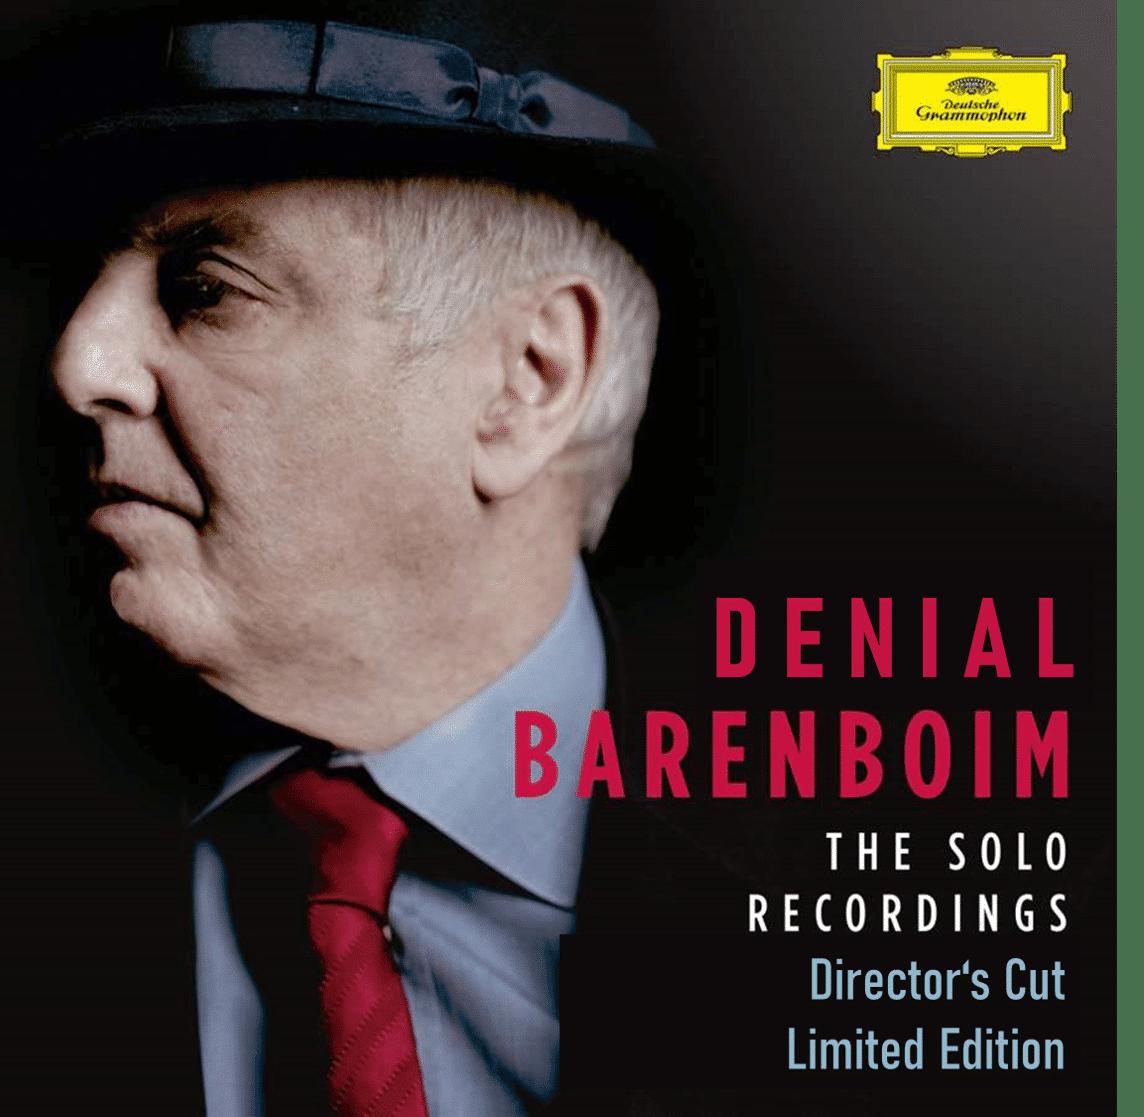 Daniel Barenboim 'needs to wear a body-com at work'